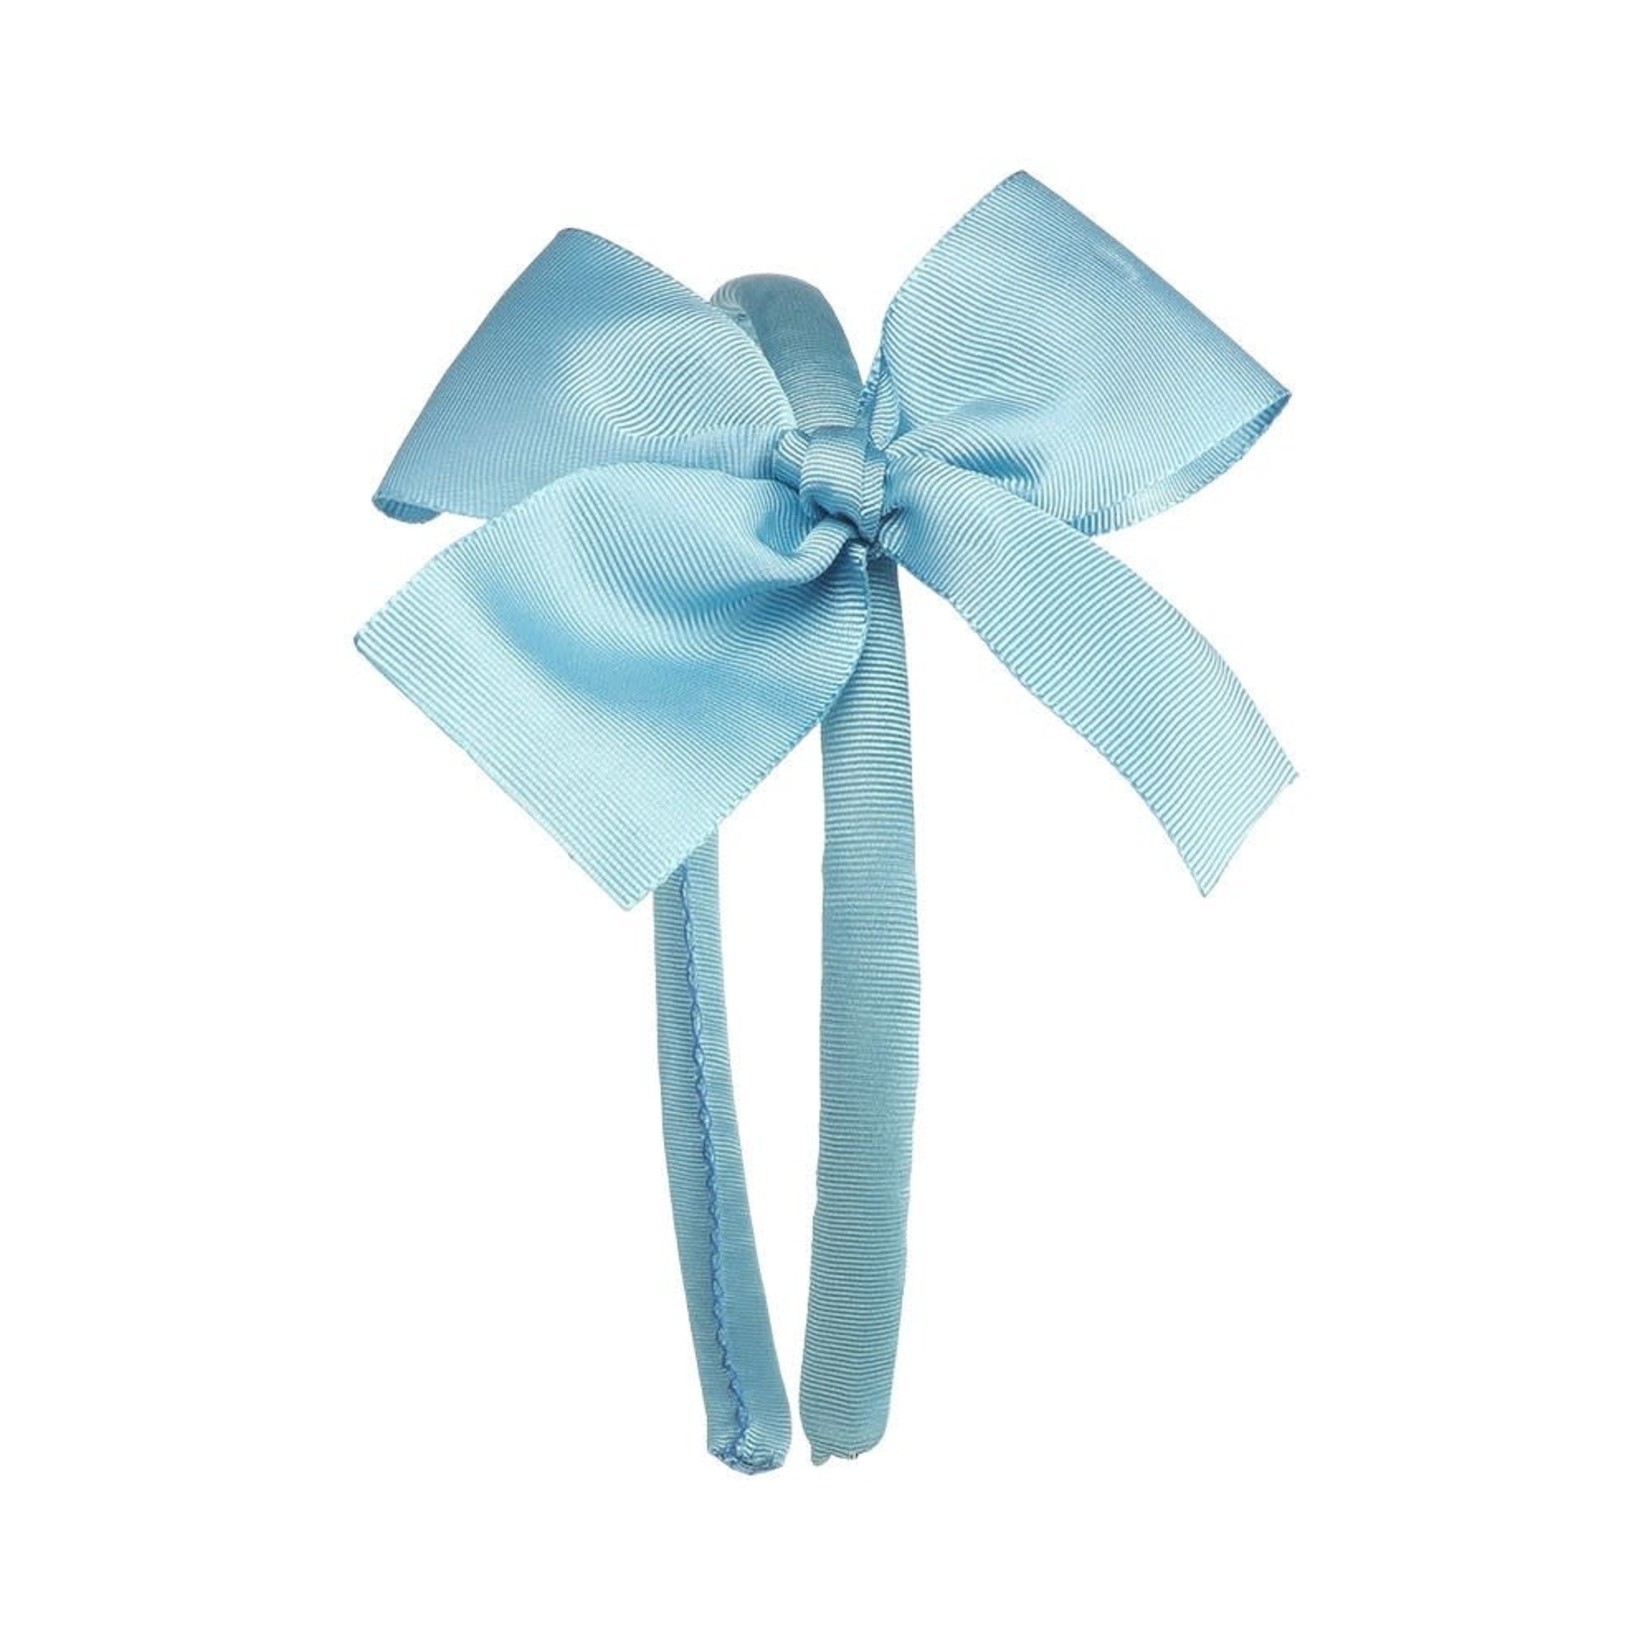 Siena Diadeem Large Bow - Turquoise